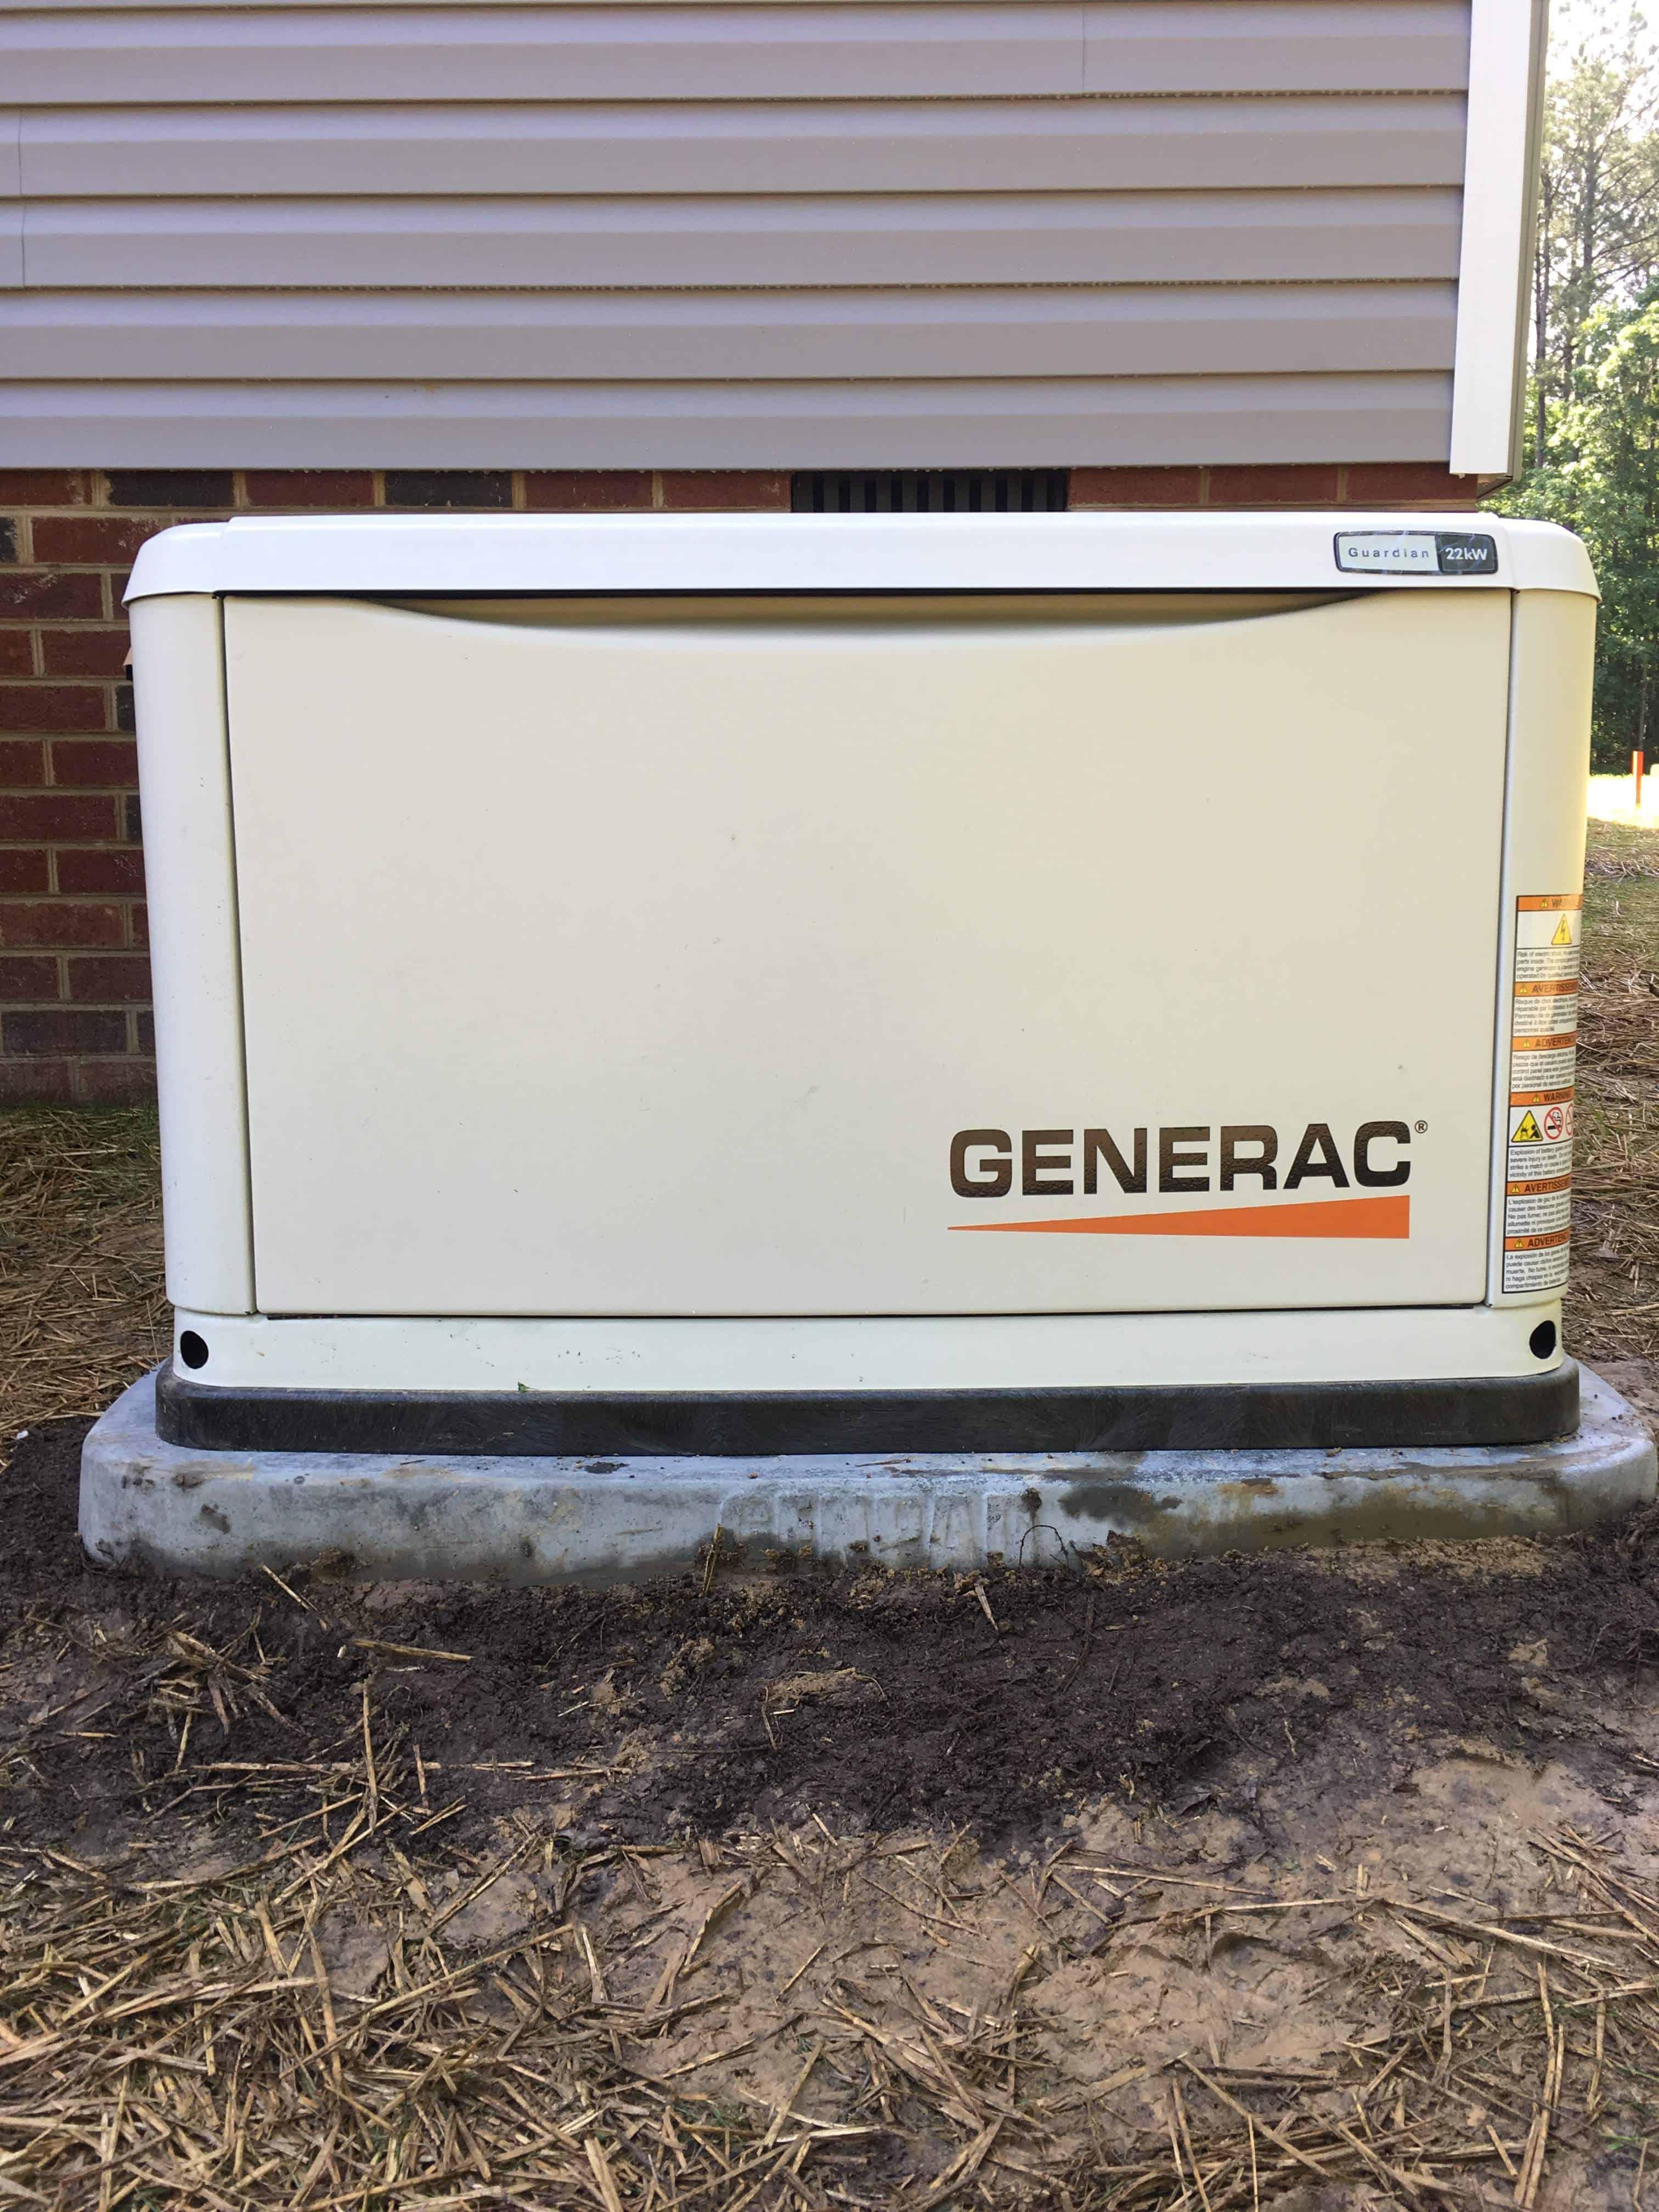 Generac Automatic Standby Generator Dinwiddie County